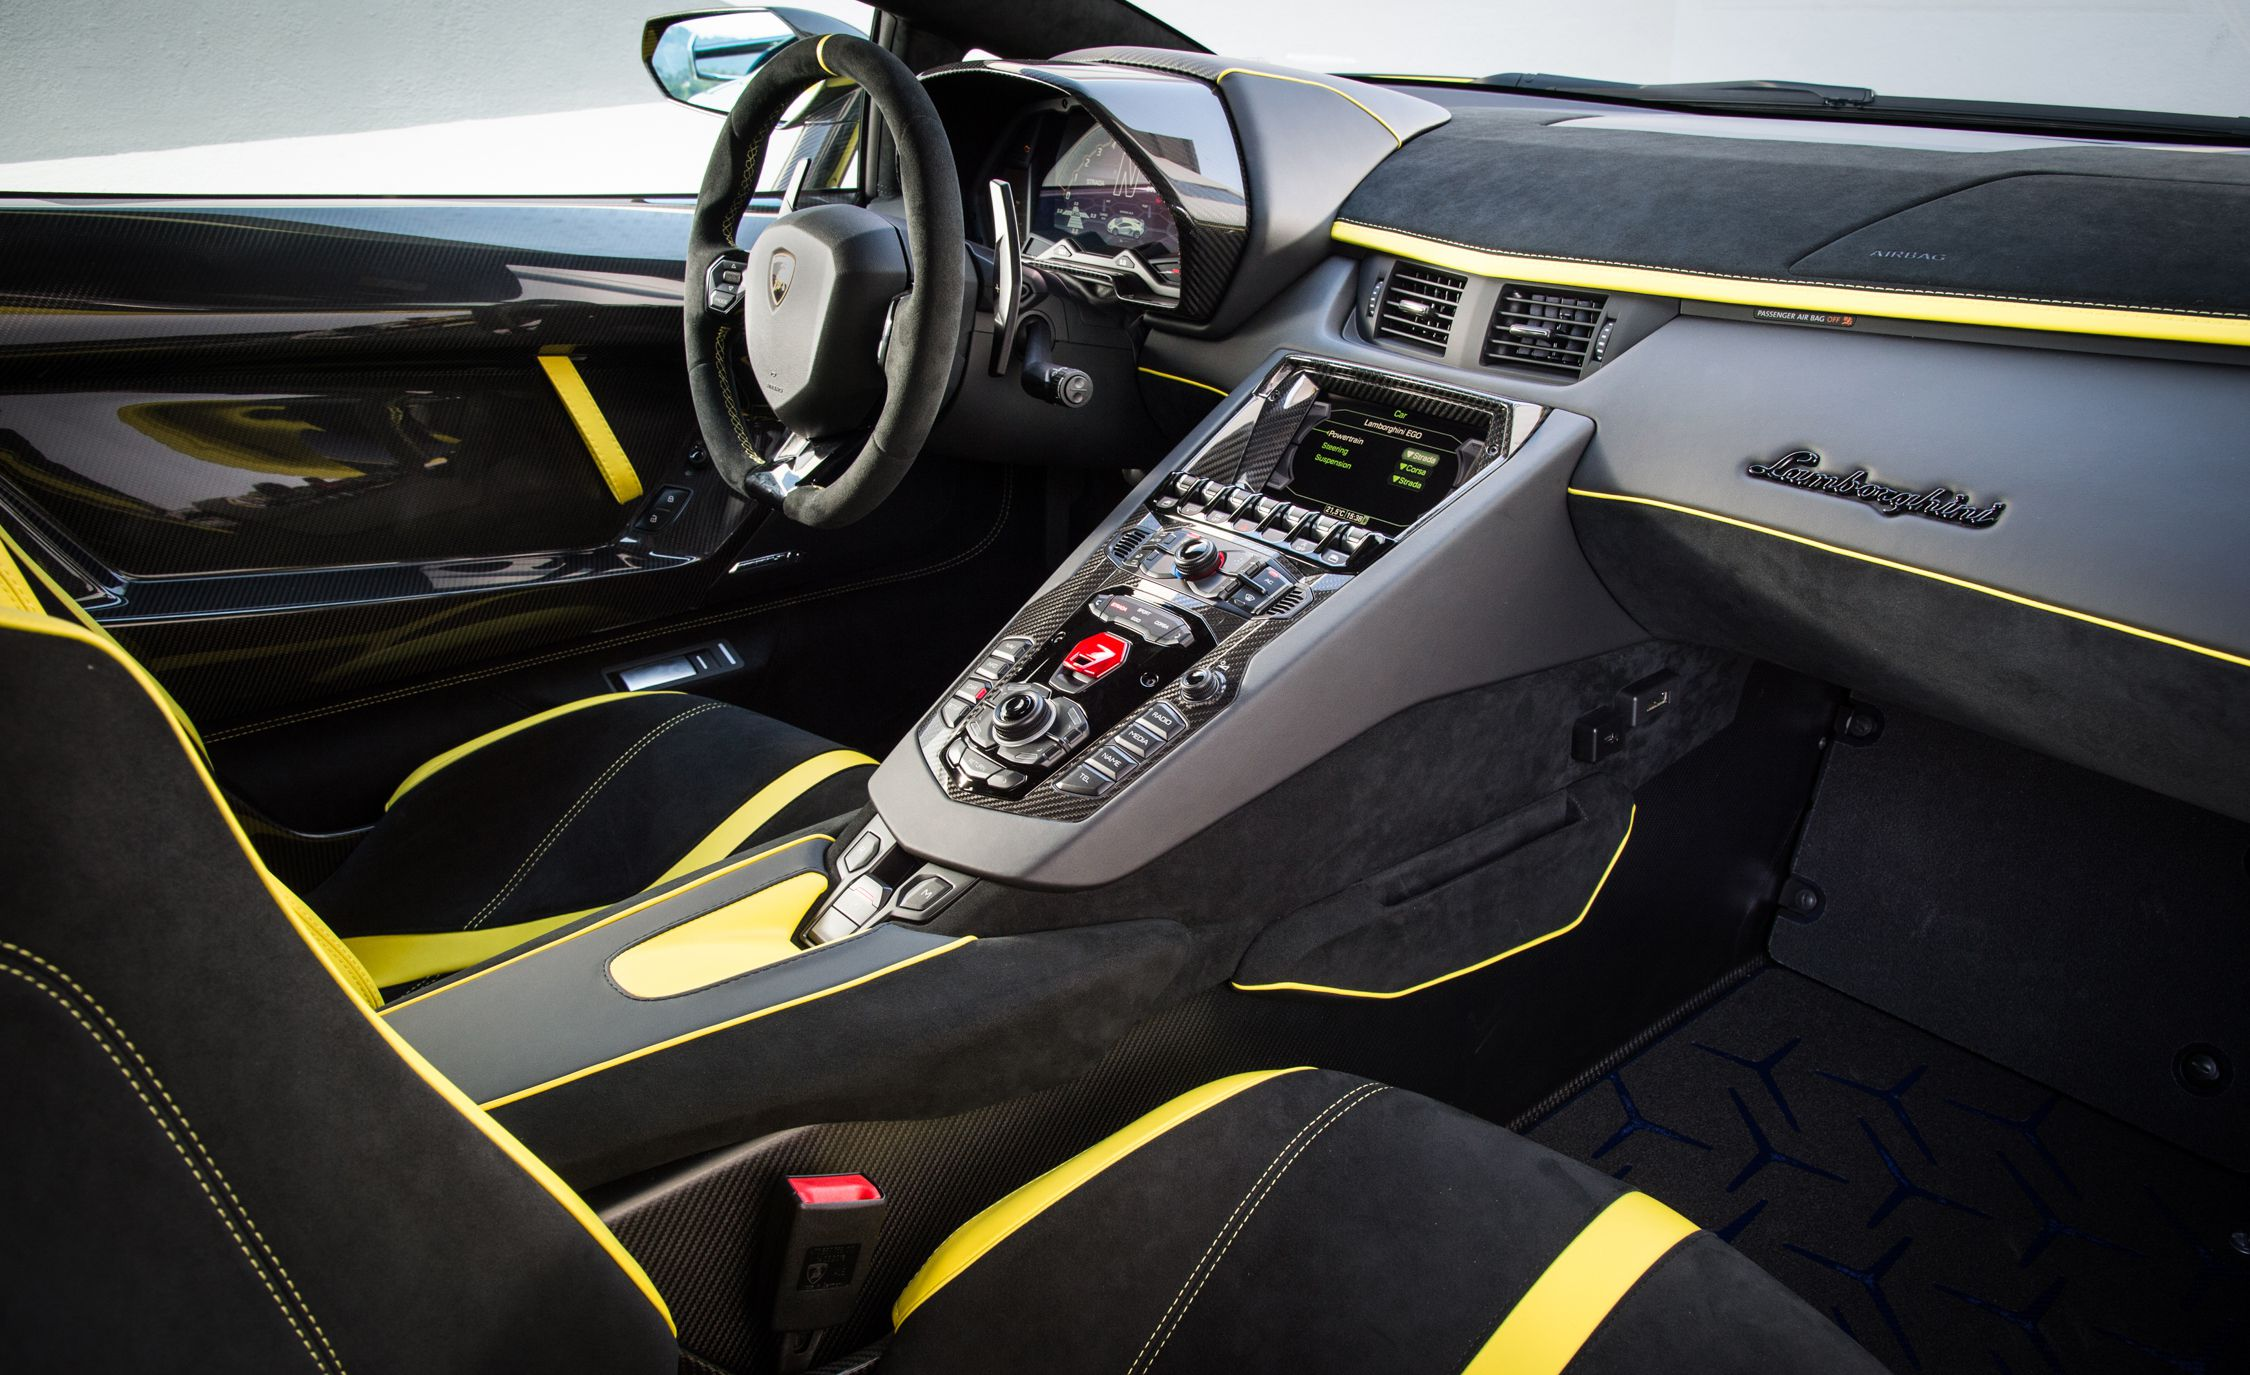 2019 Lamborghini Aventador SVJ Interior Front Seats Wallpapers #107 of 241